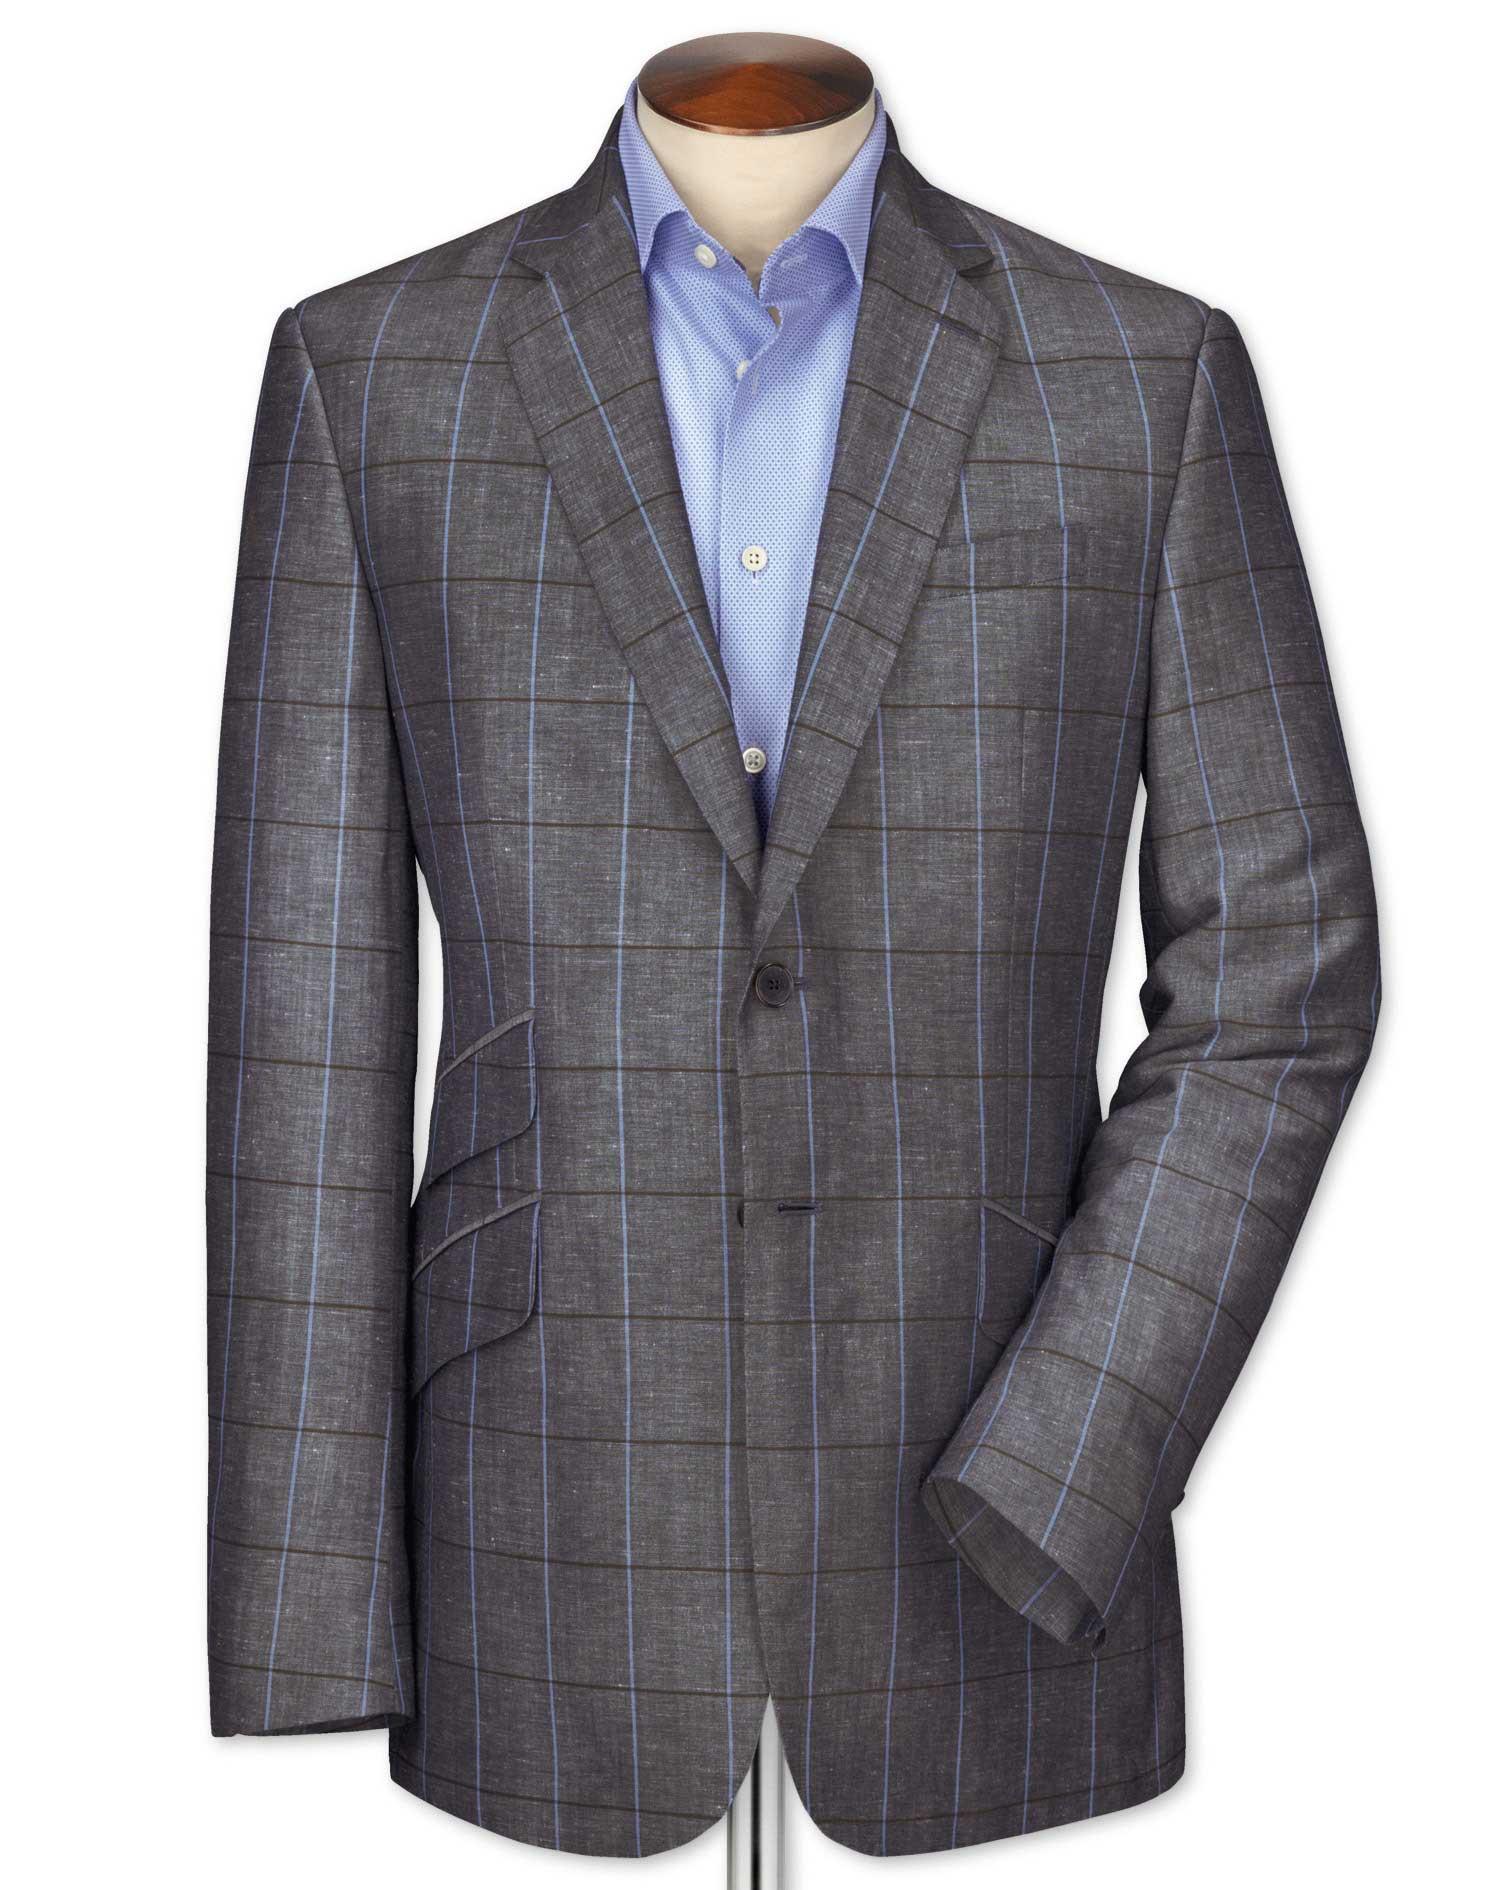 Slim Fit Navy Checkered Luxury Wool Linen Wool Jacket Size 44 Regular by Charles Tyrwhitt